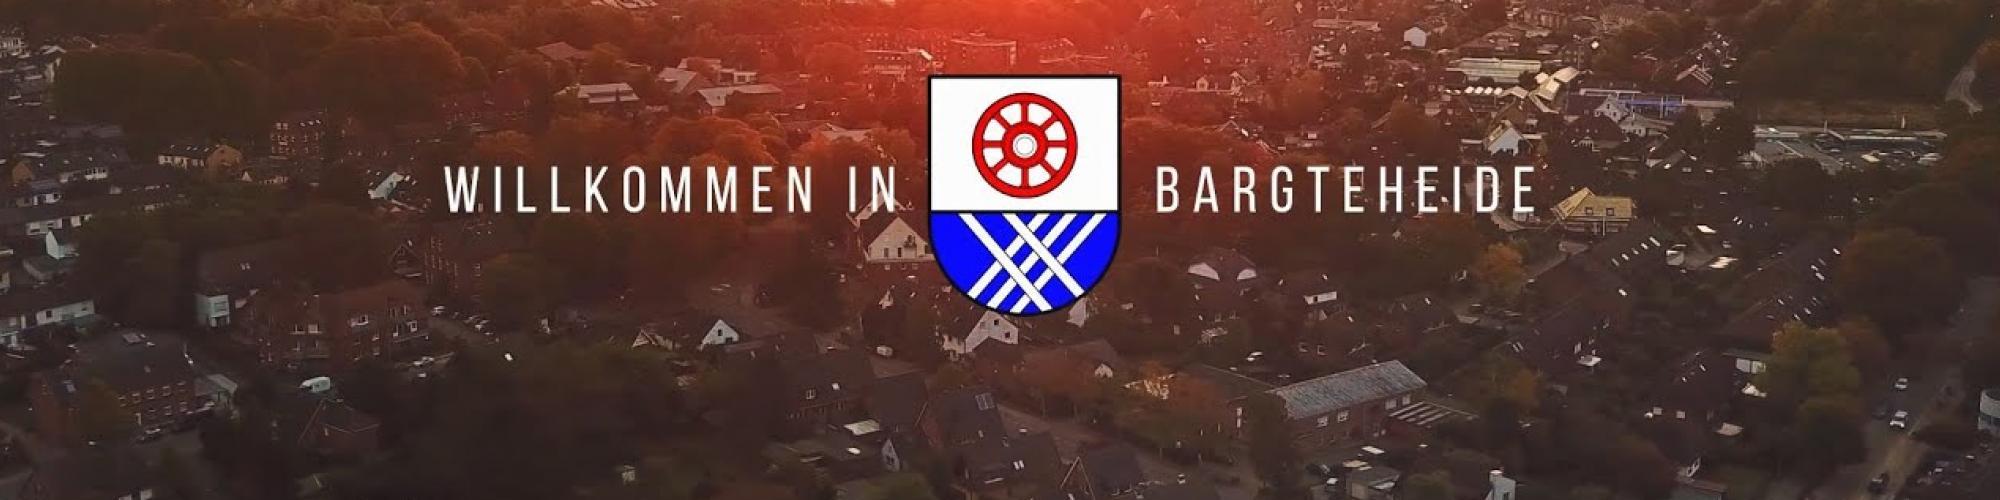 AIRE Hanseatischer Hof Betriebsgesellschaft mbH